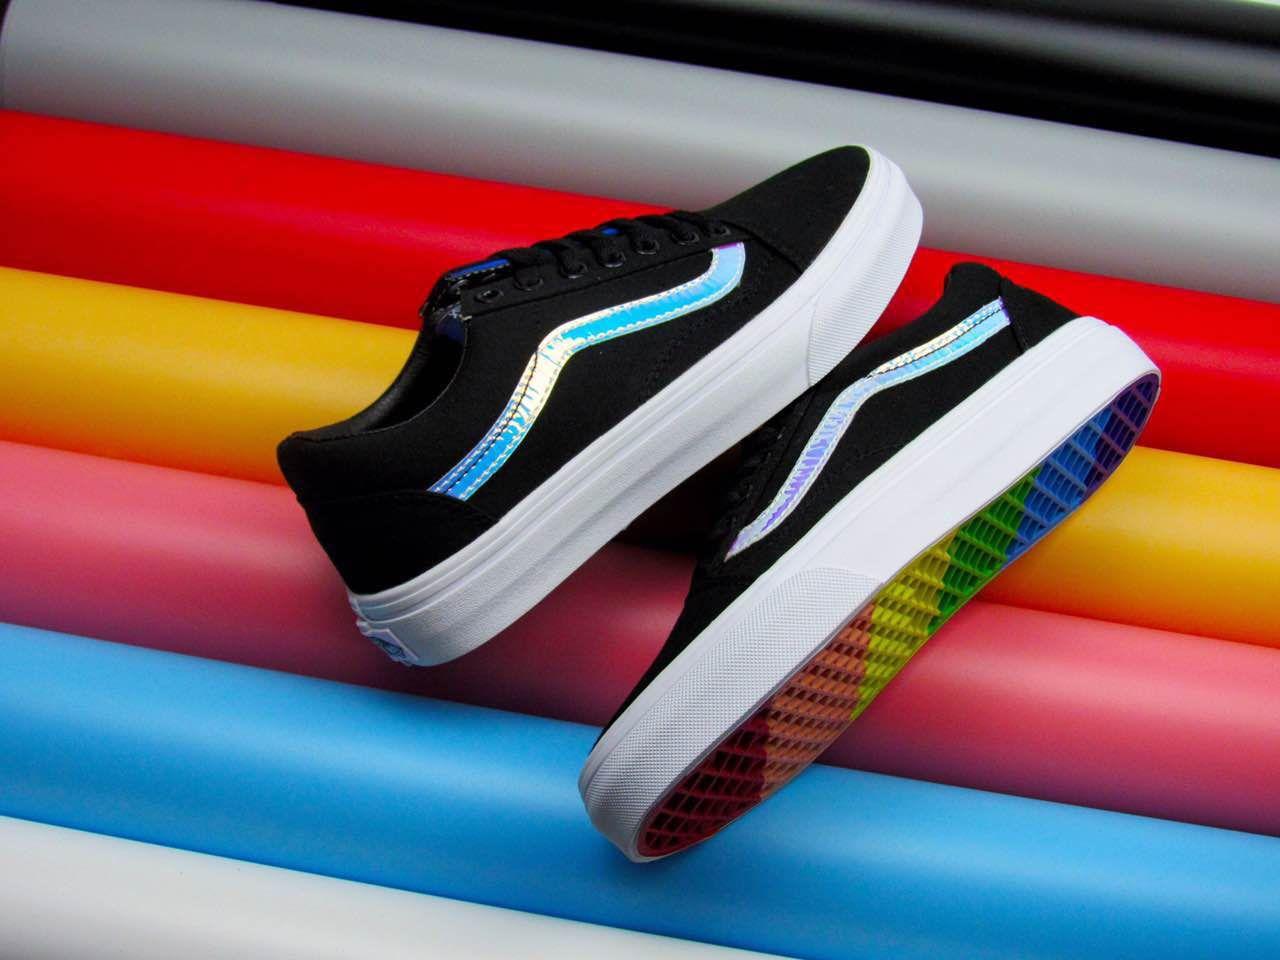 05268e122b1d 2017 Vans Old Skool Low Classic Colorful Skate Shoes  Vans ...